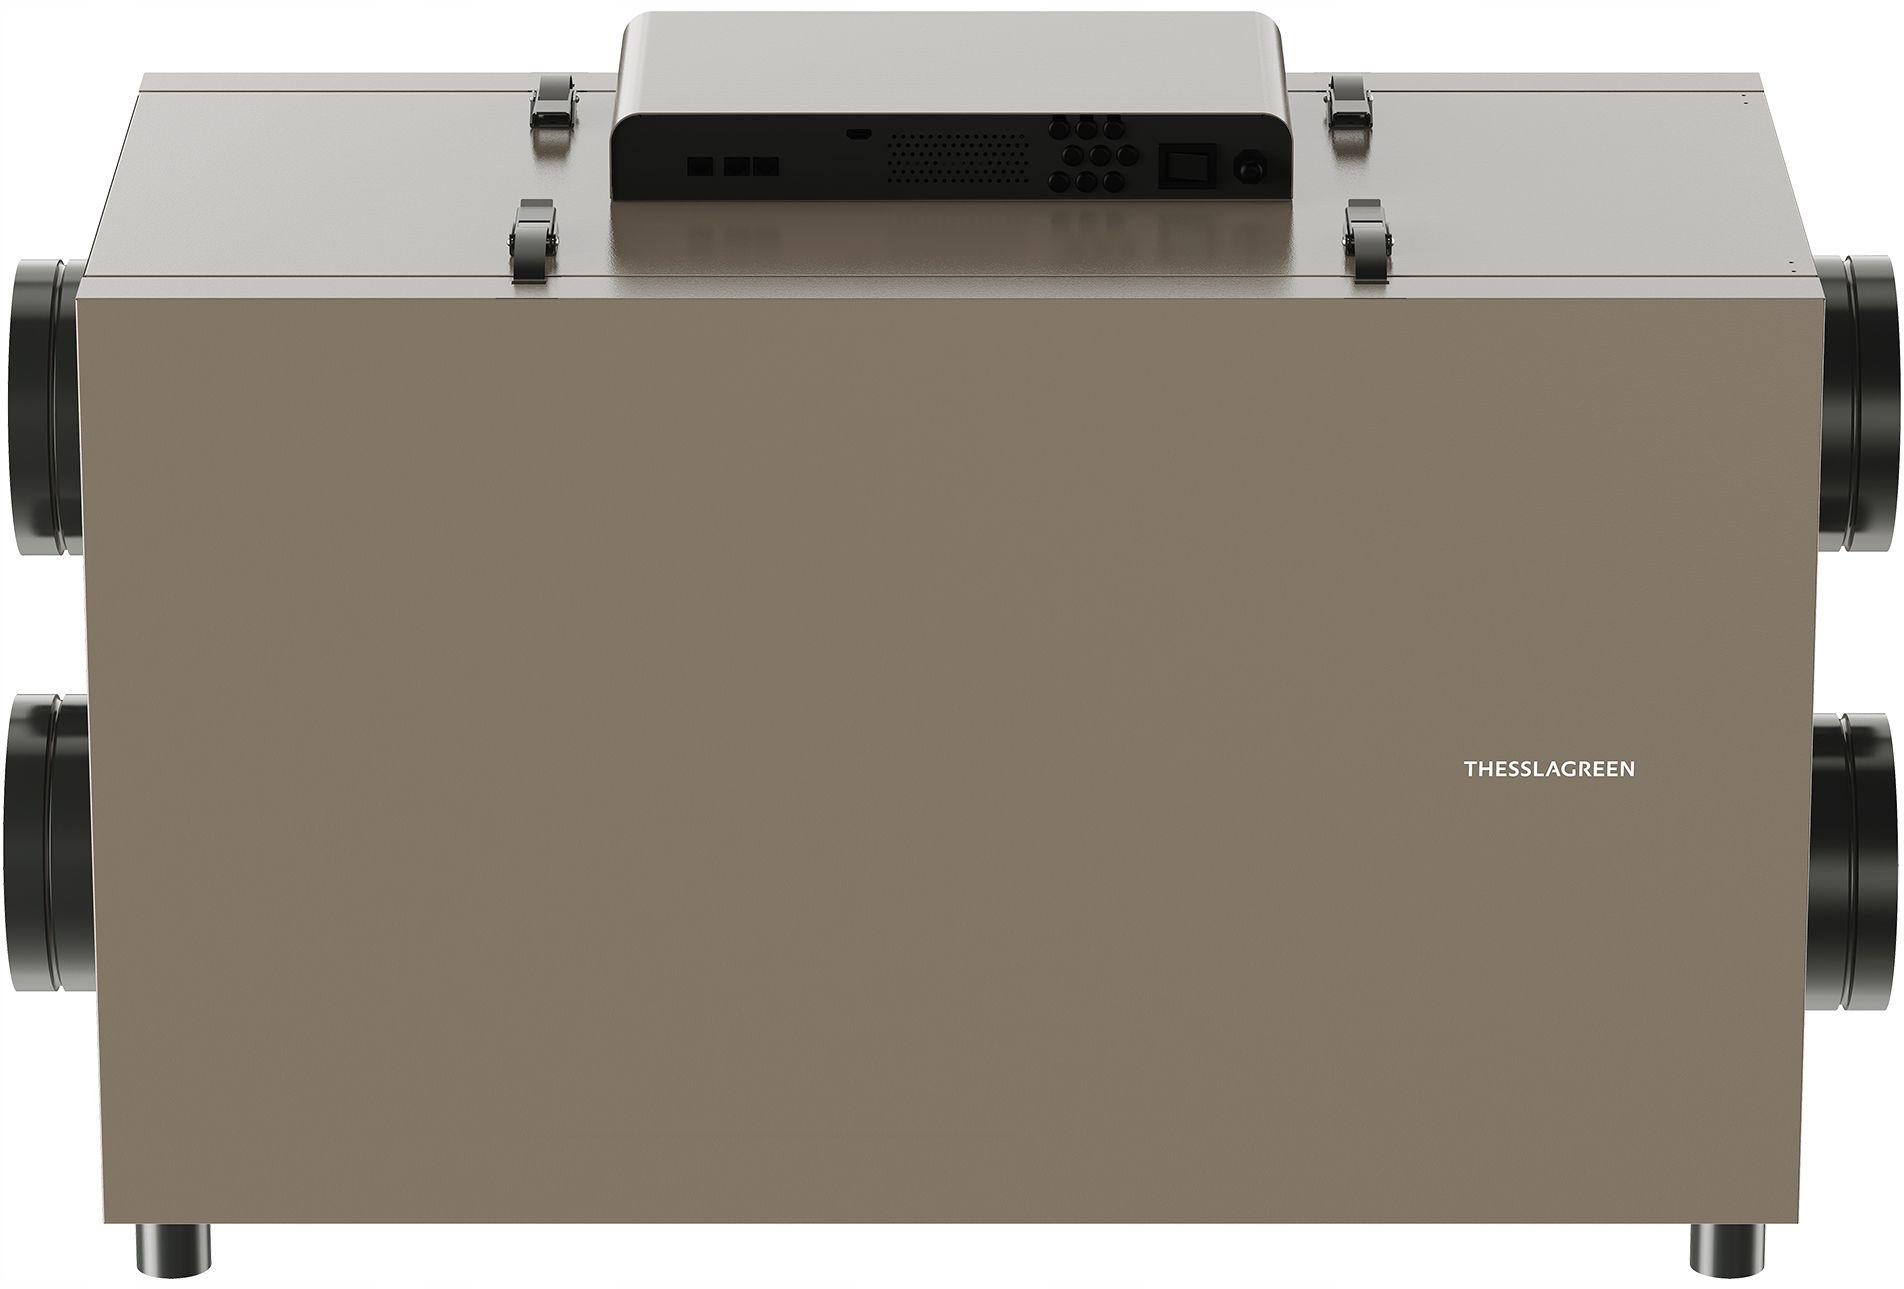 Rekuperator Thessla AP Home 650h Energy+ montaż Centrala wentylacyjna TG Home 650h Energy+